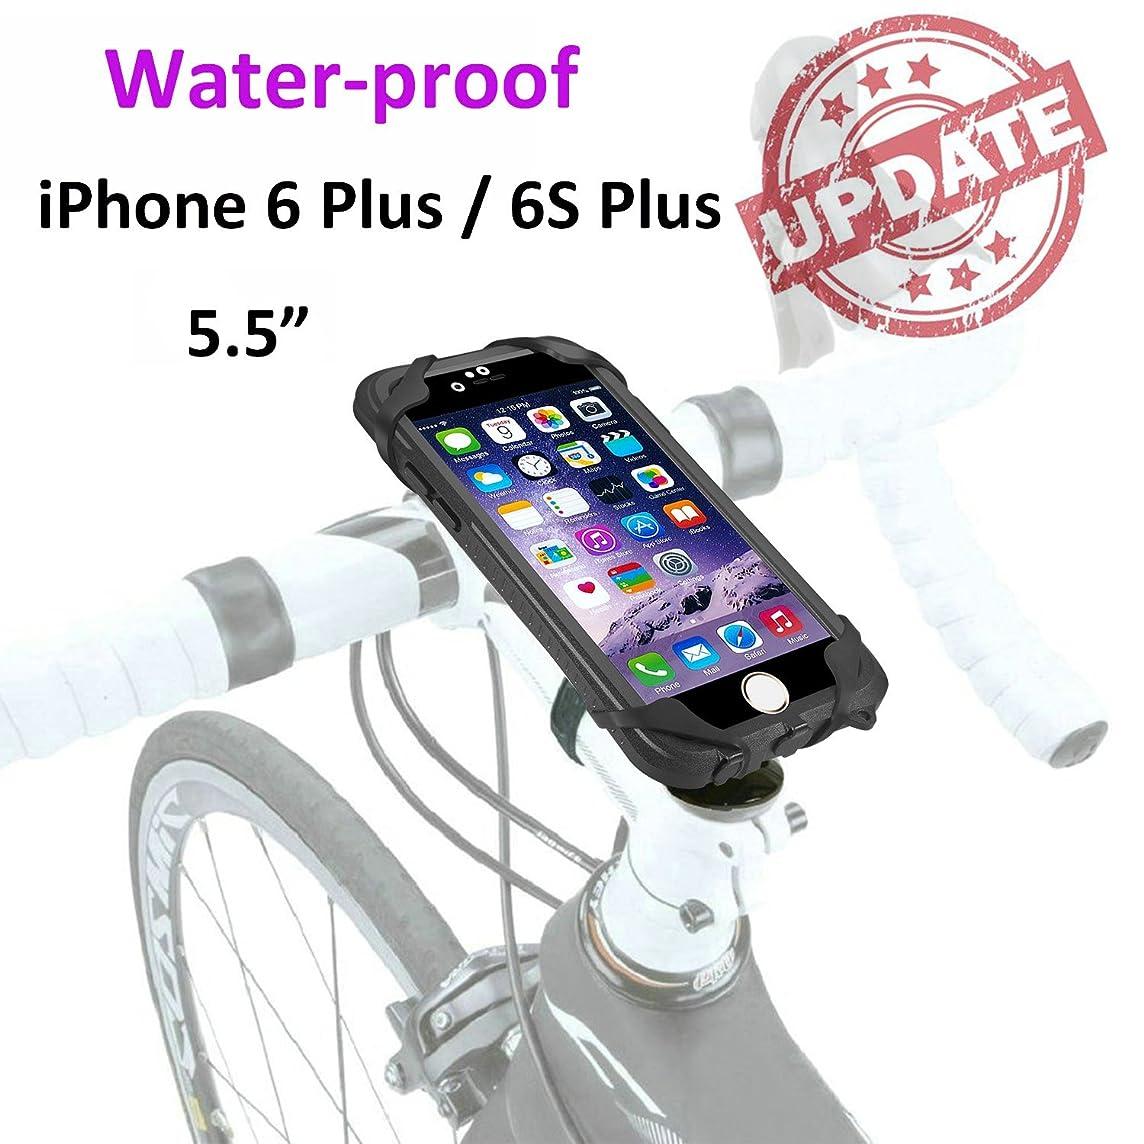 Bike Mount Waterproof, Jebsens Rotatable Bicycle Phone Mount WPI6P, iPhone 6 Plus & 6S Plus Shock Resistant Stemcap Bike Mount Holder with Waterproof Phone Case, Handle Bar Adapter and Rubber Strap